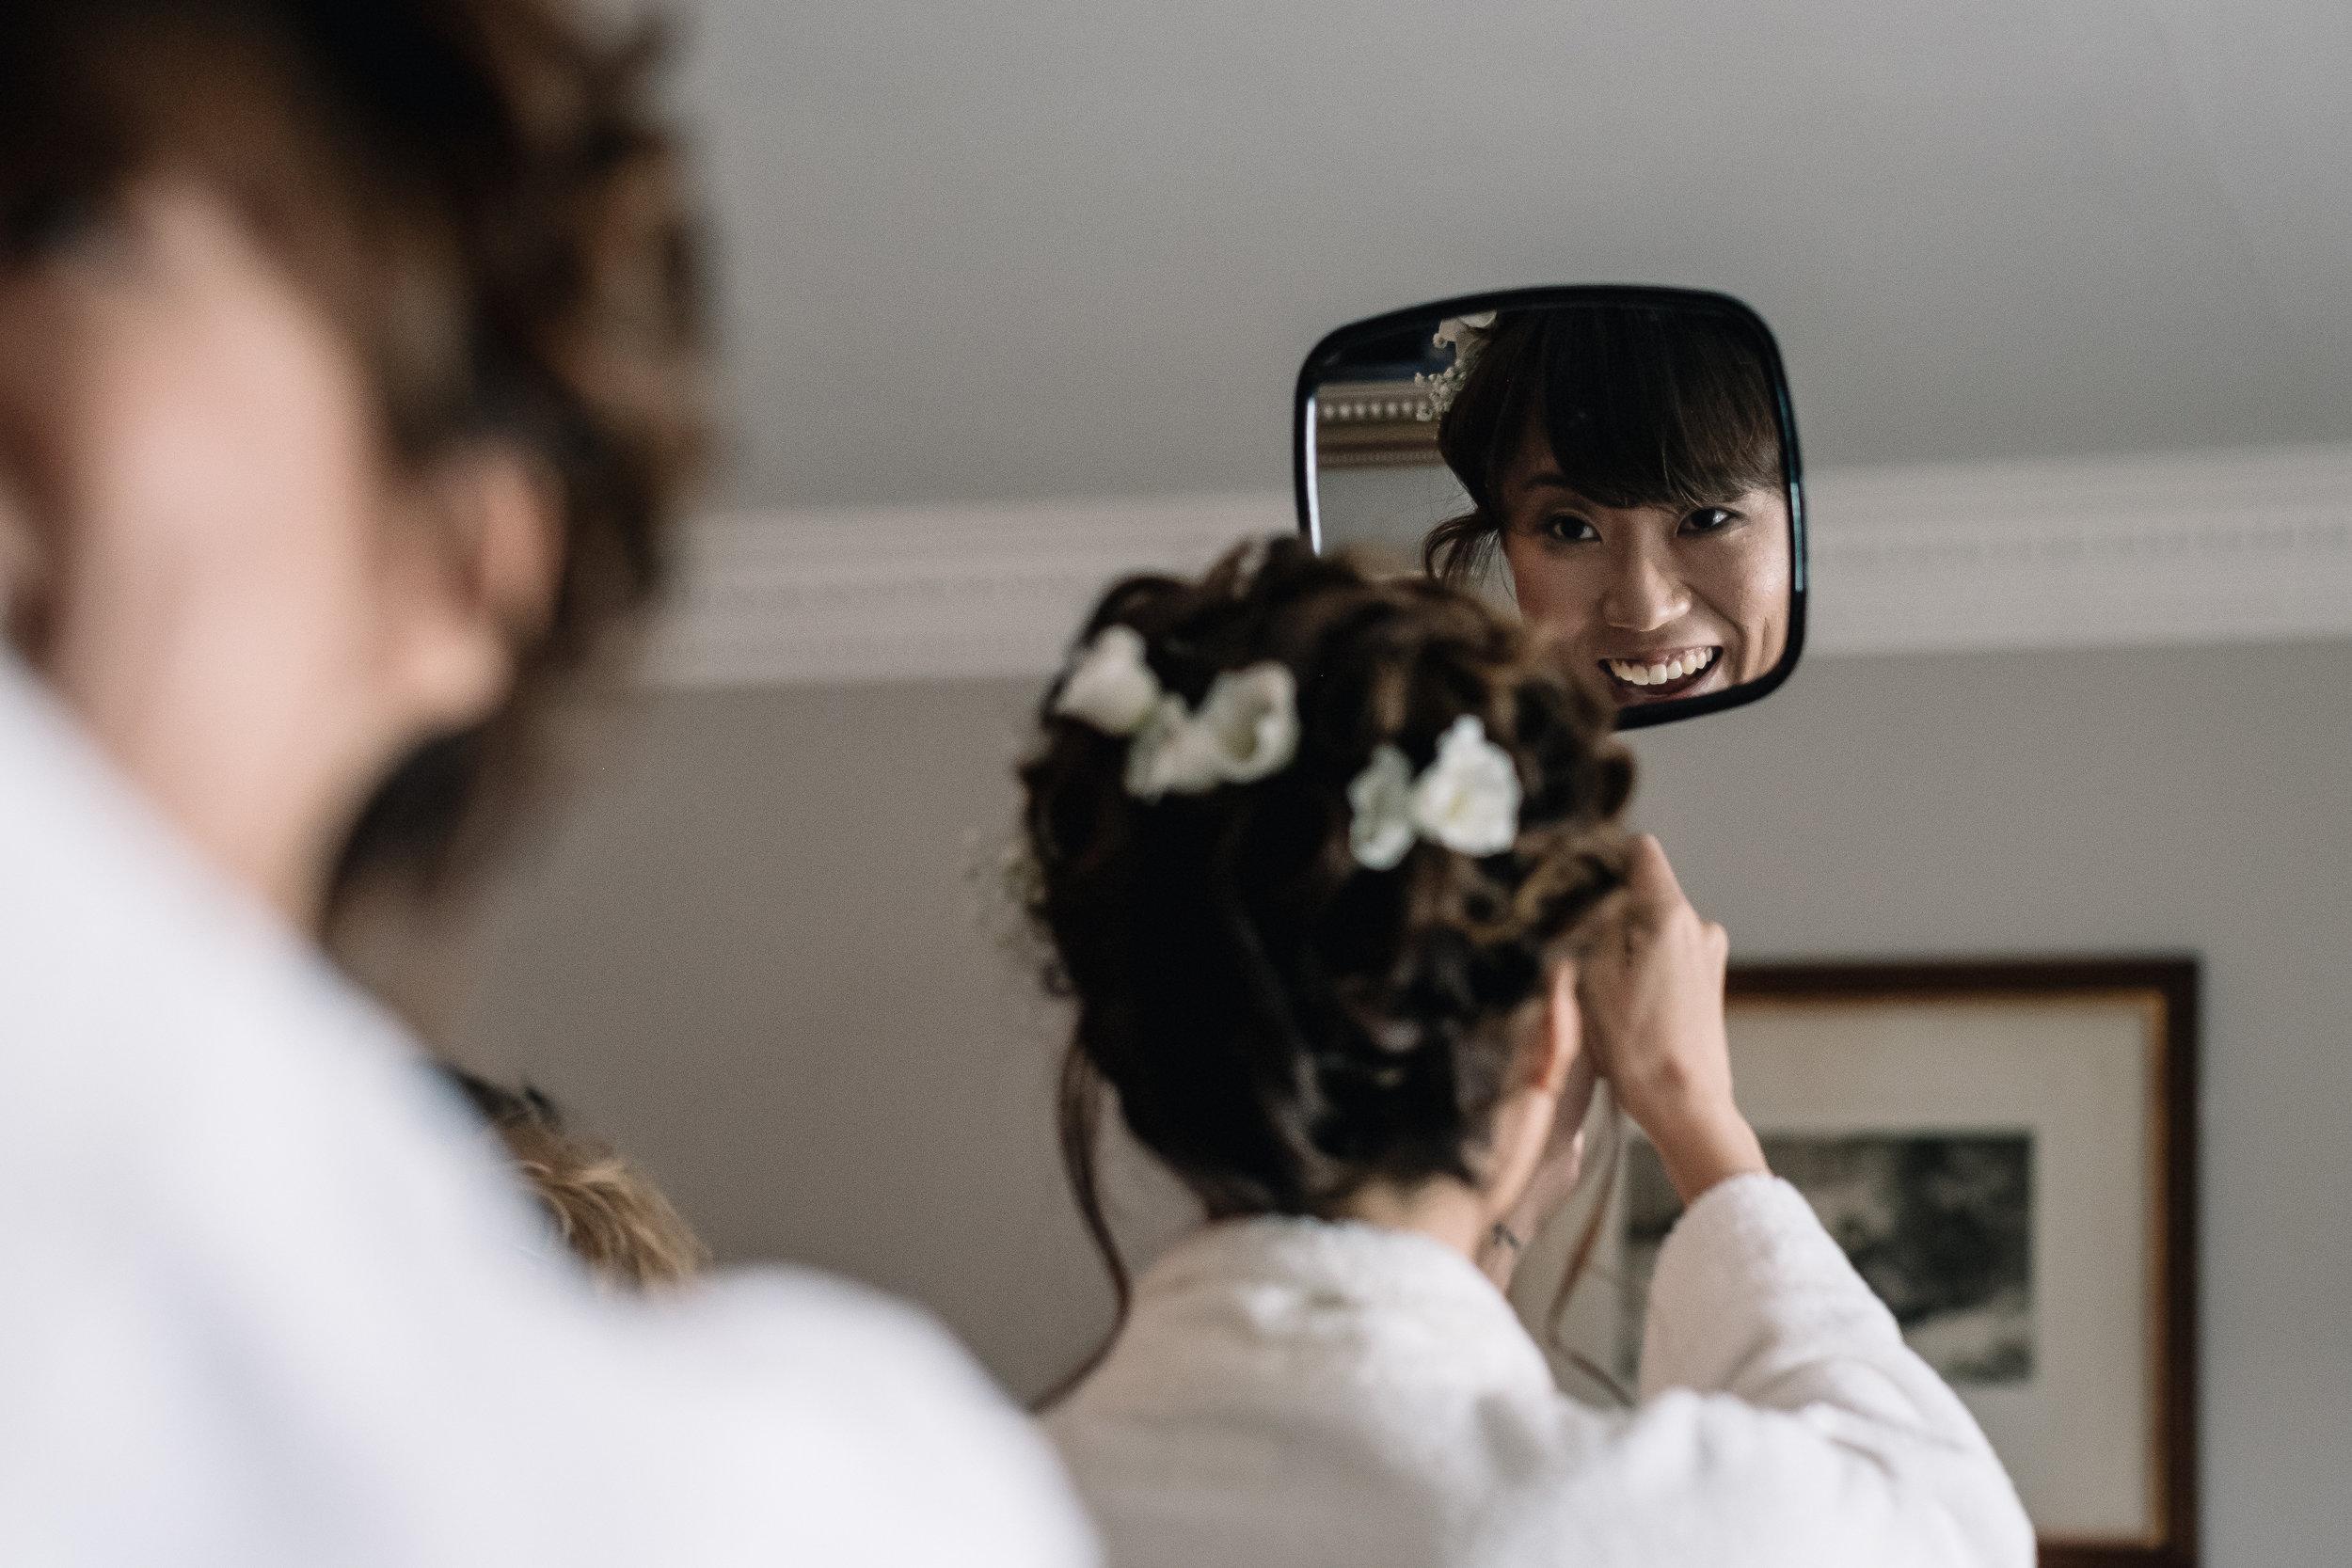 Bride checks hair in hand held mirror